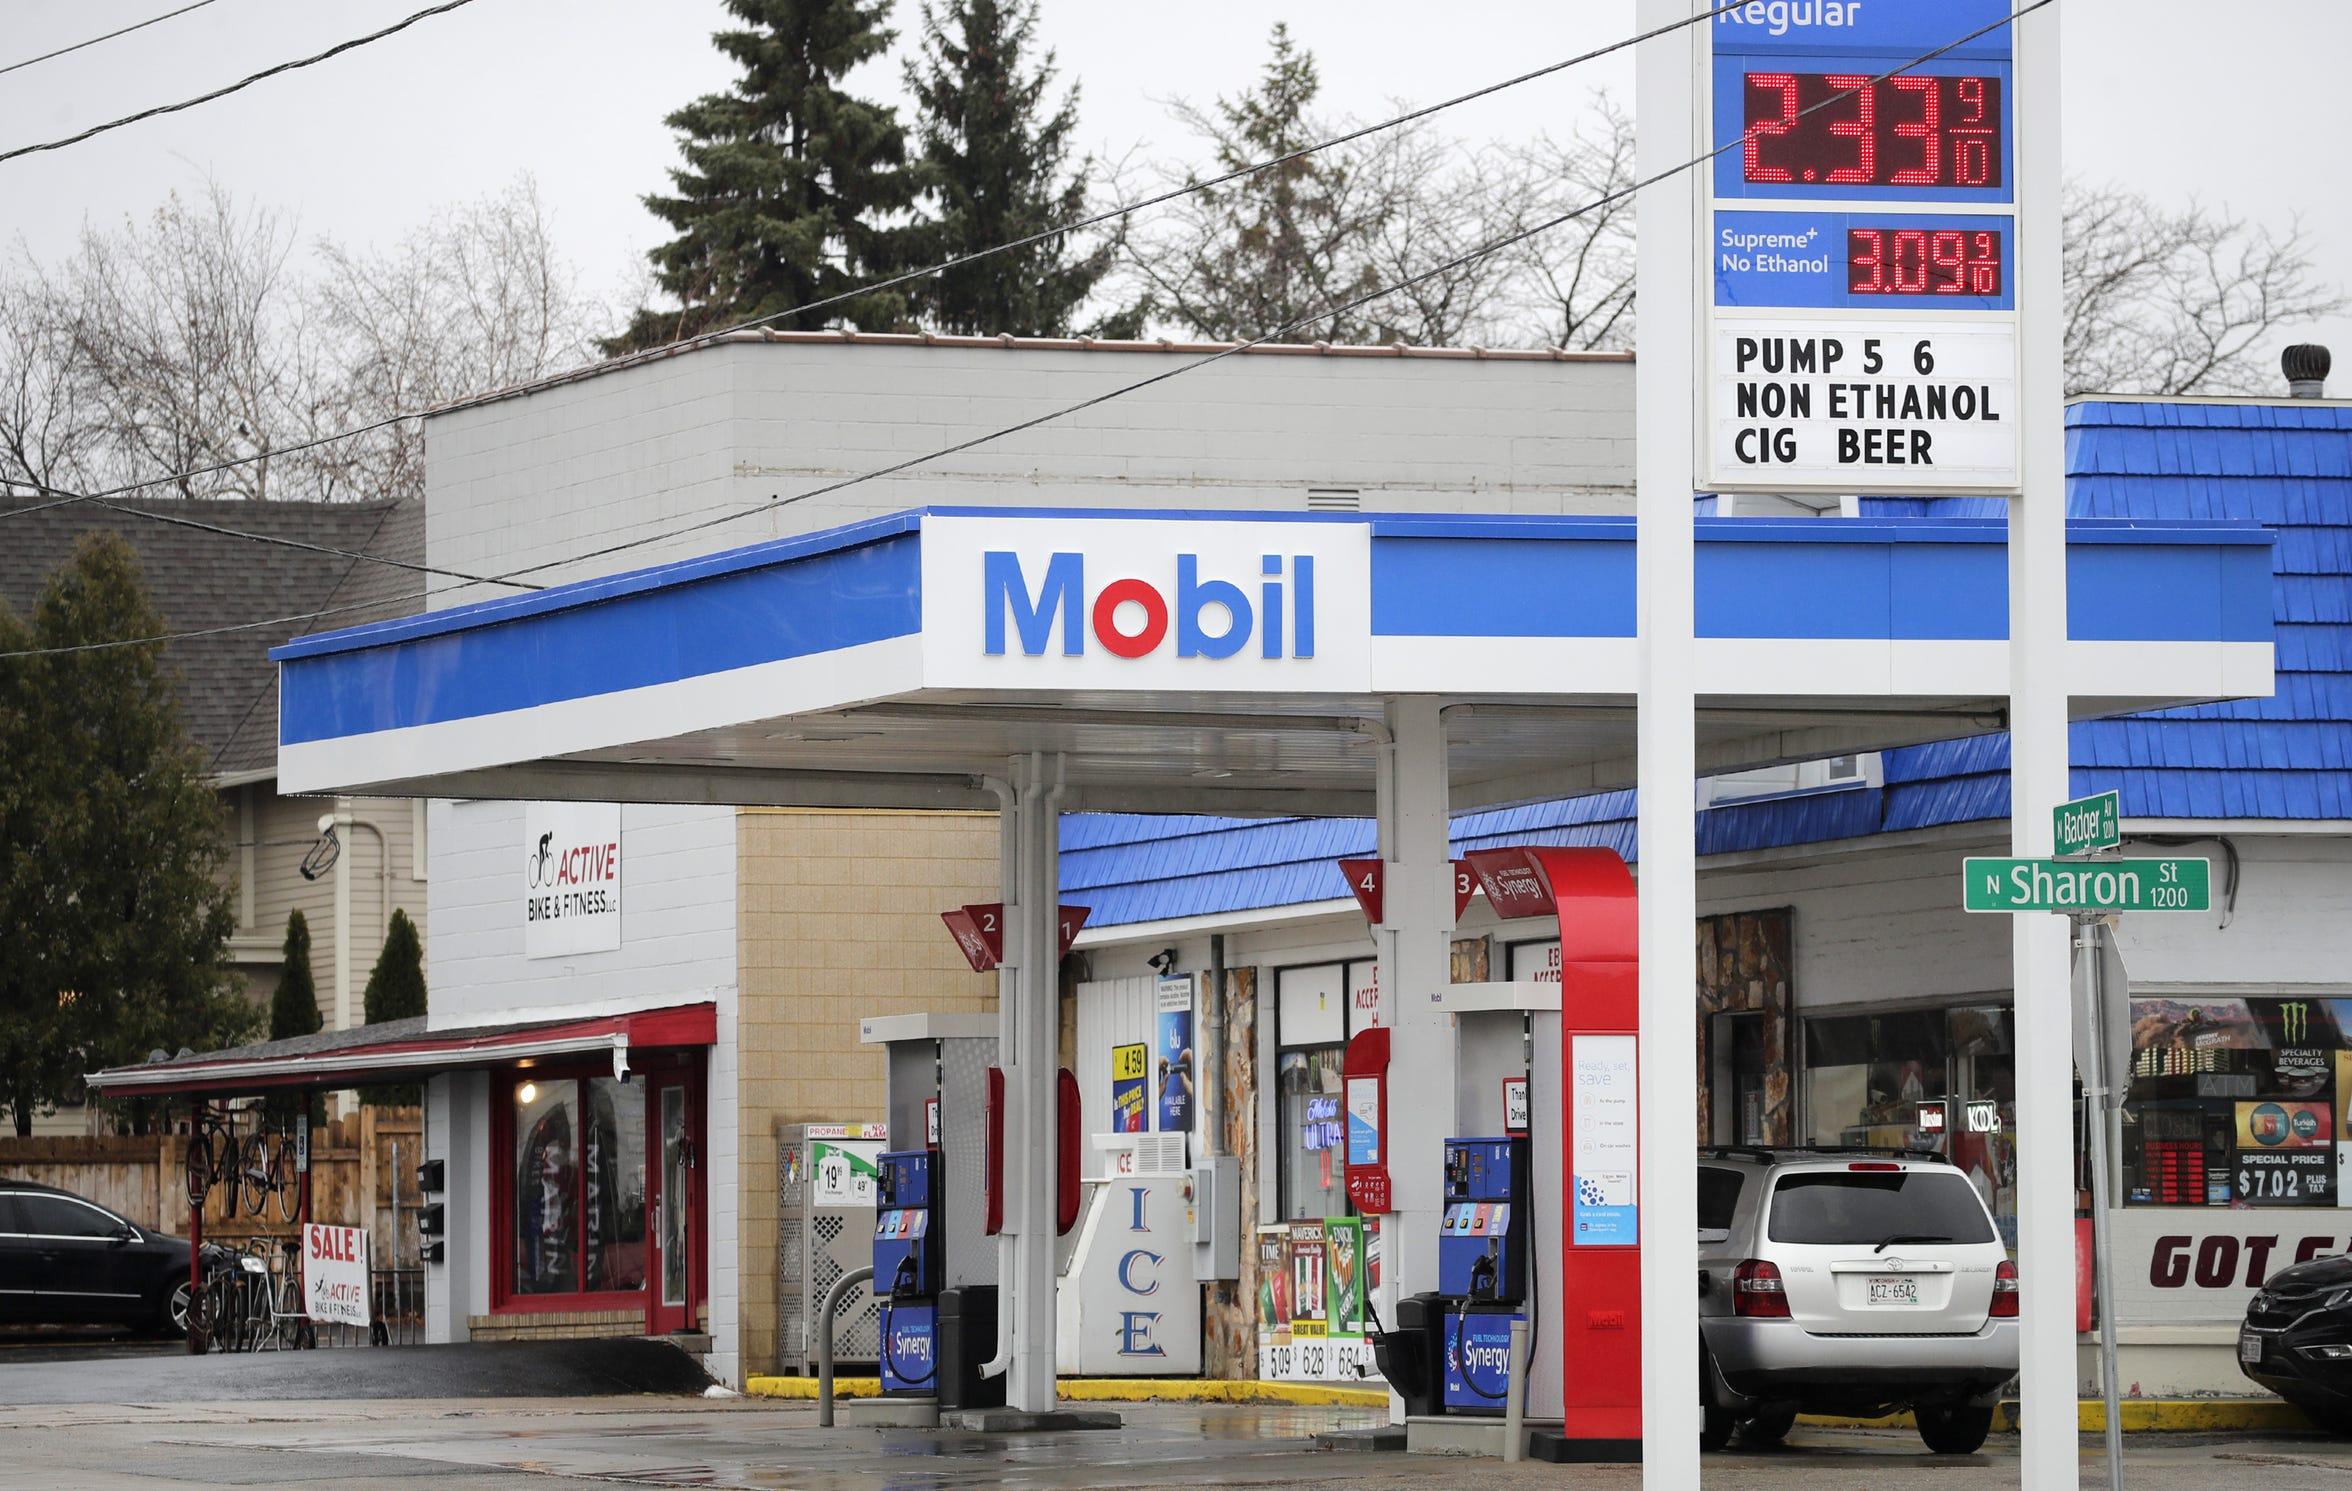 The Mobil gas station at 1201 North Badger Avenue Saturday, Nov. 24, 2018, in Appleton.